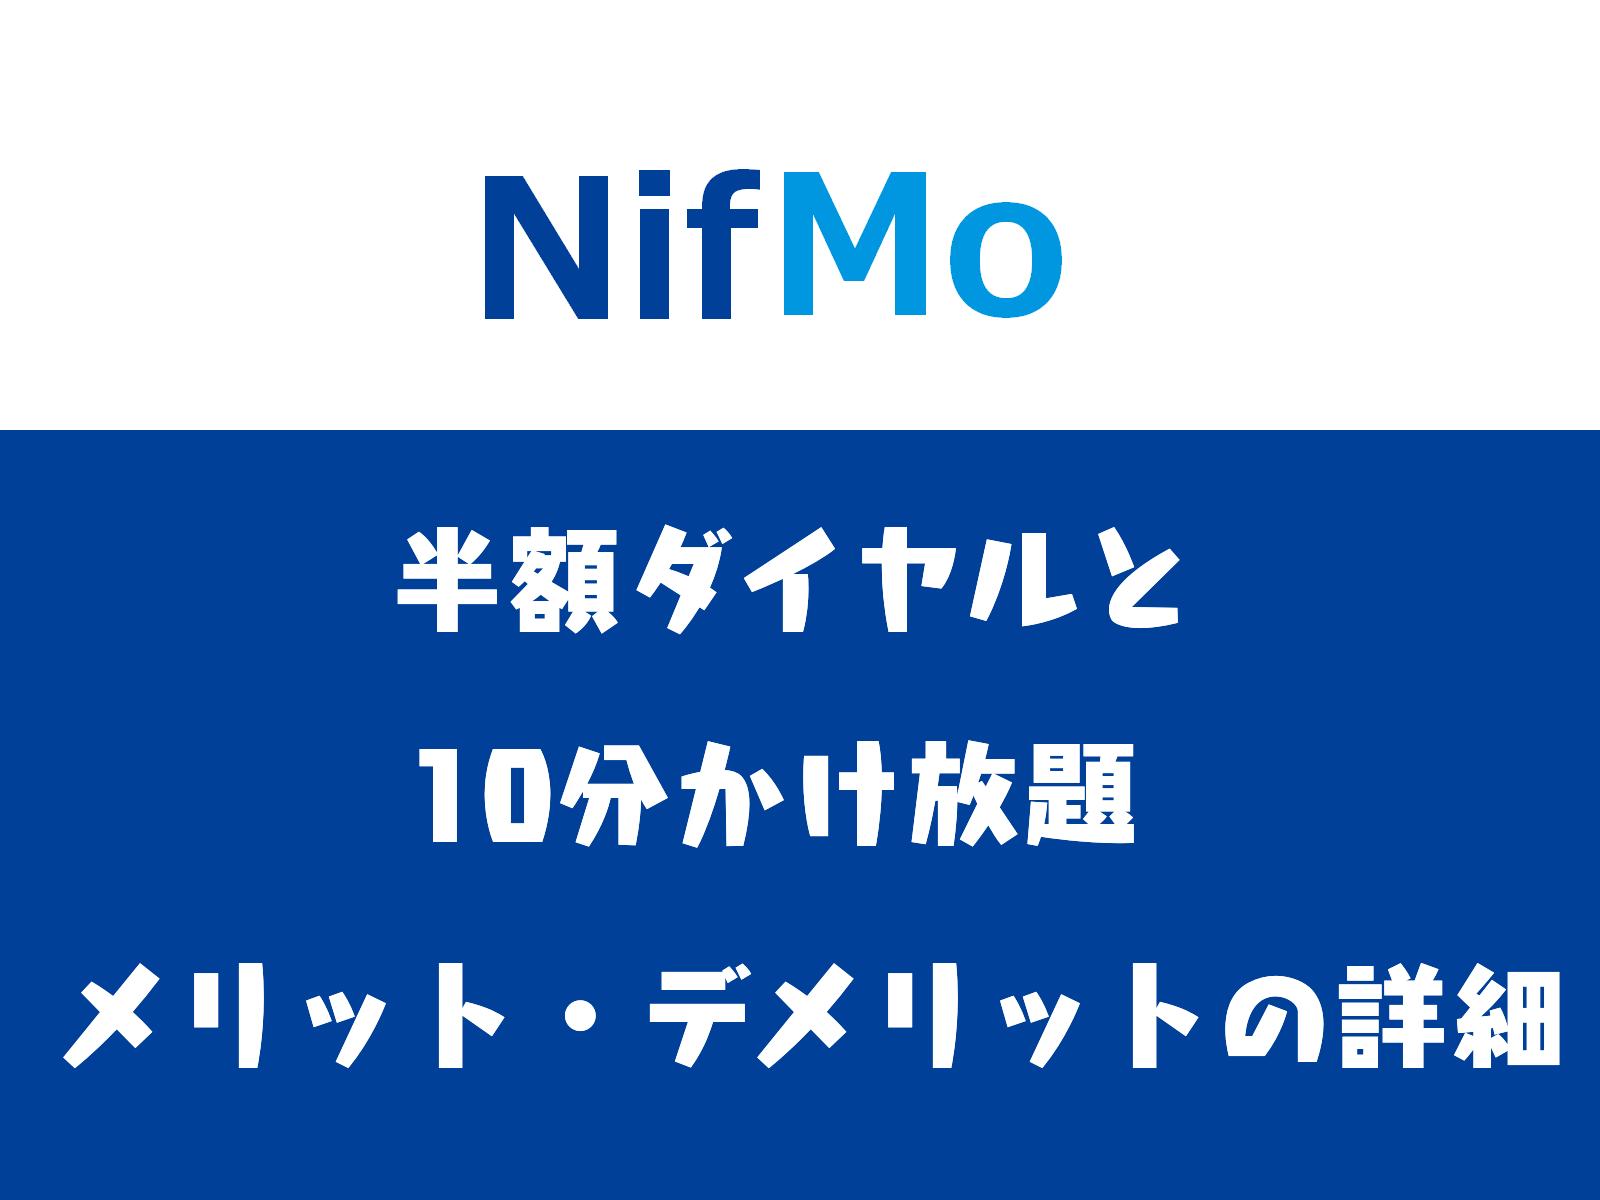 【NifMo】半額ダイヤルと10分かけ放題の詳細のアイキャッチ画像